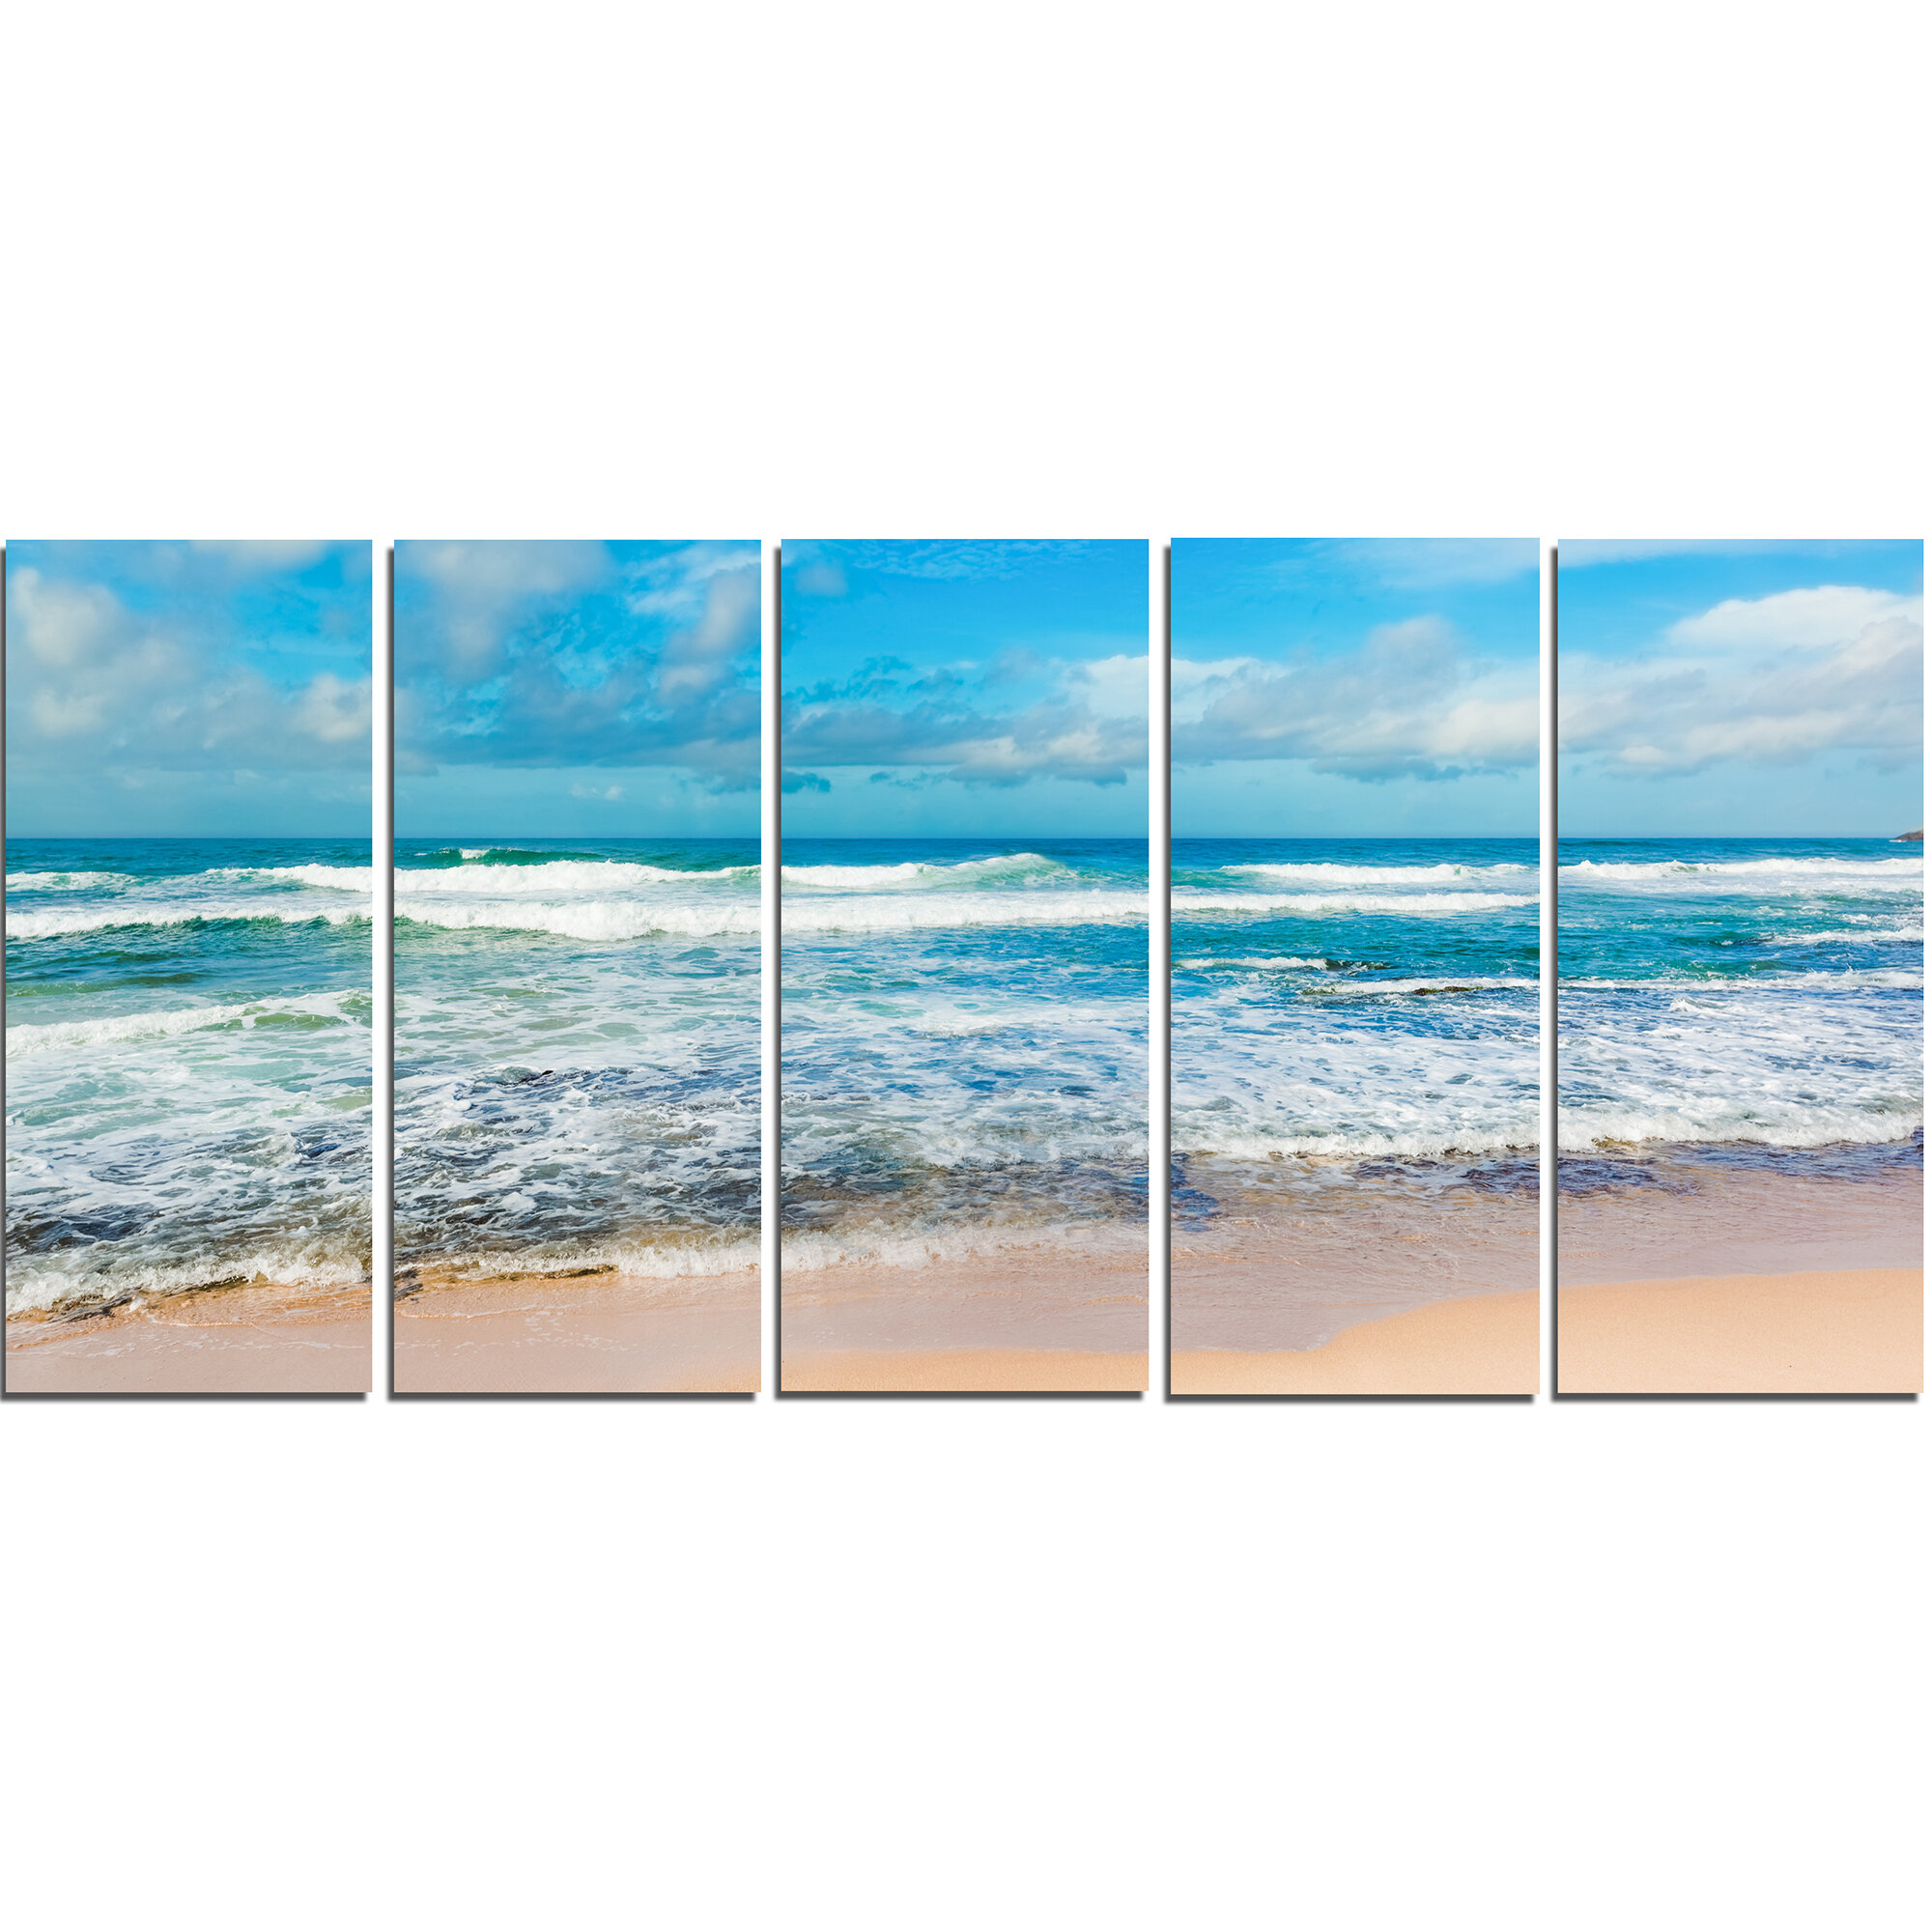 Designart Indian Ocean Panoramic View 5 Piece Photographic Print On Wrapped Canvas Set Wayfair